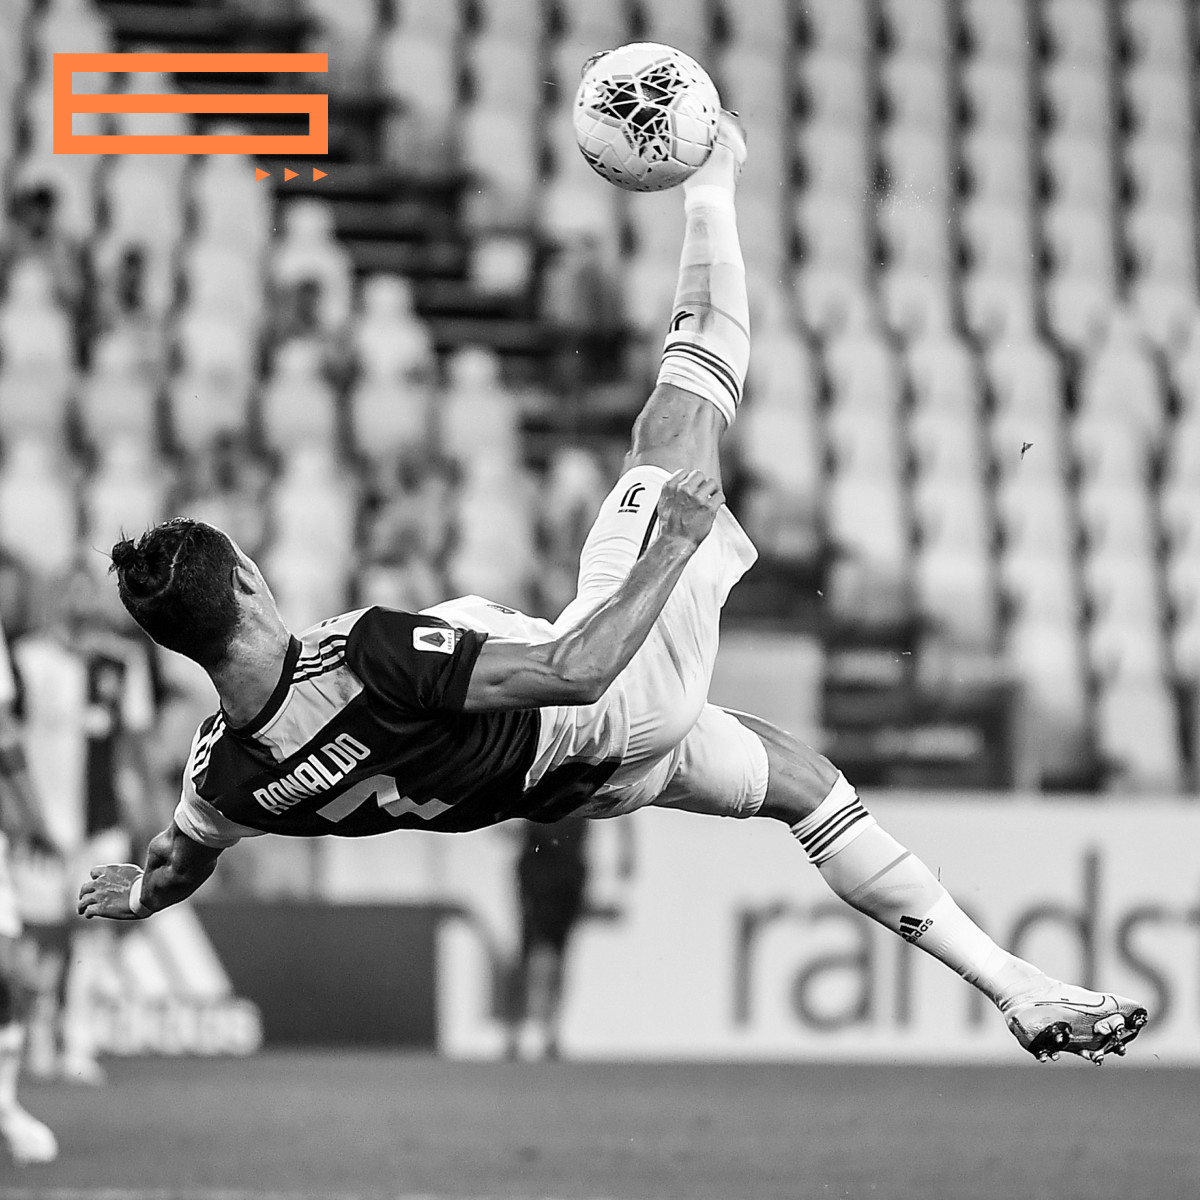 dCOVfittest_M_6_Ronaldo